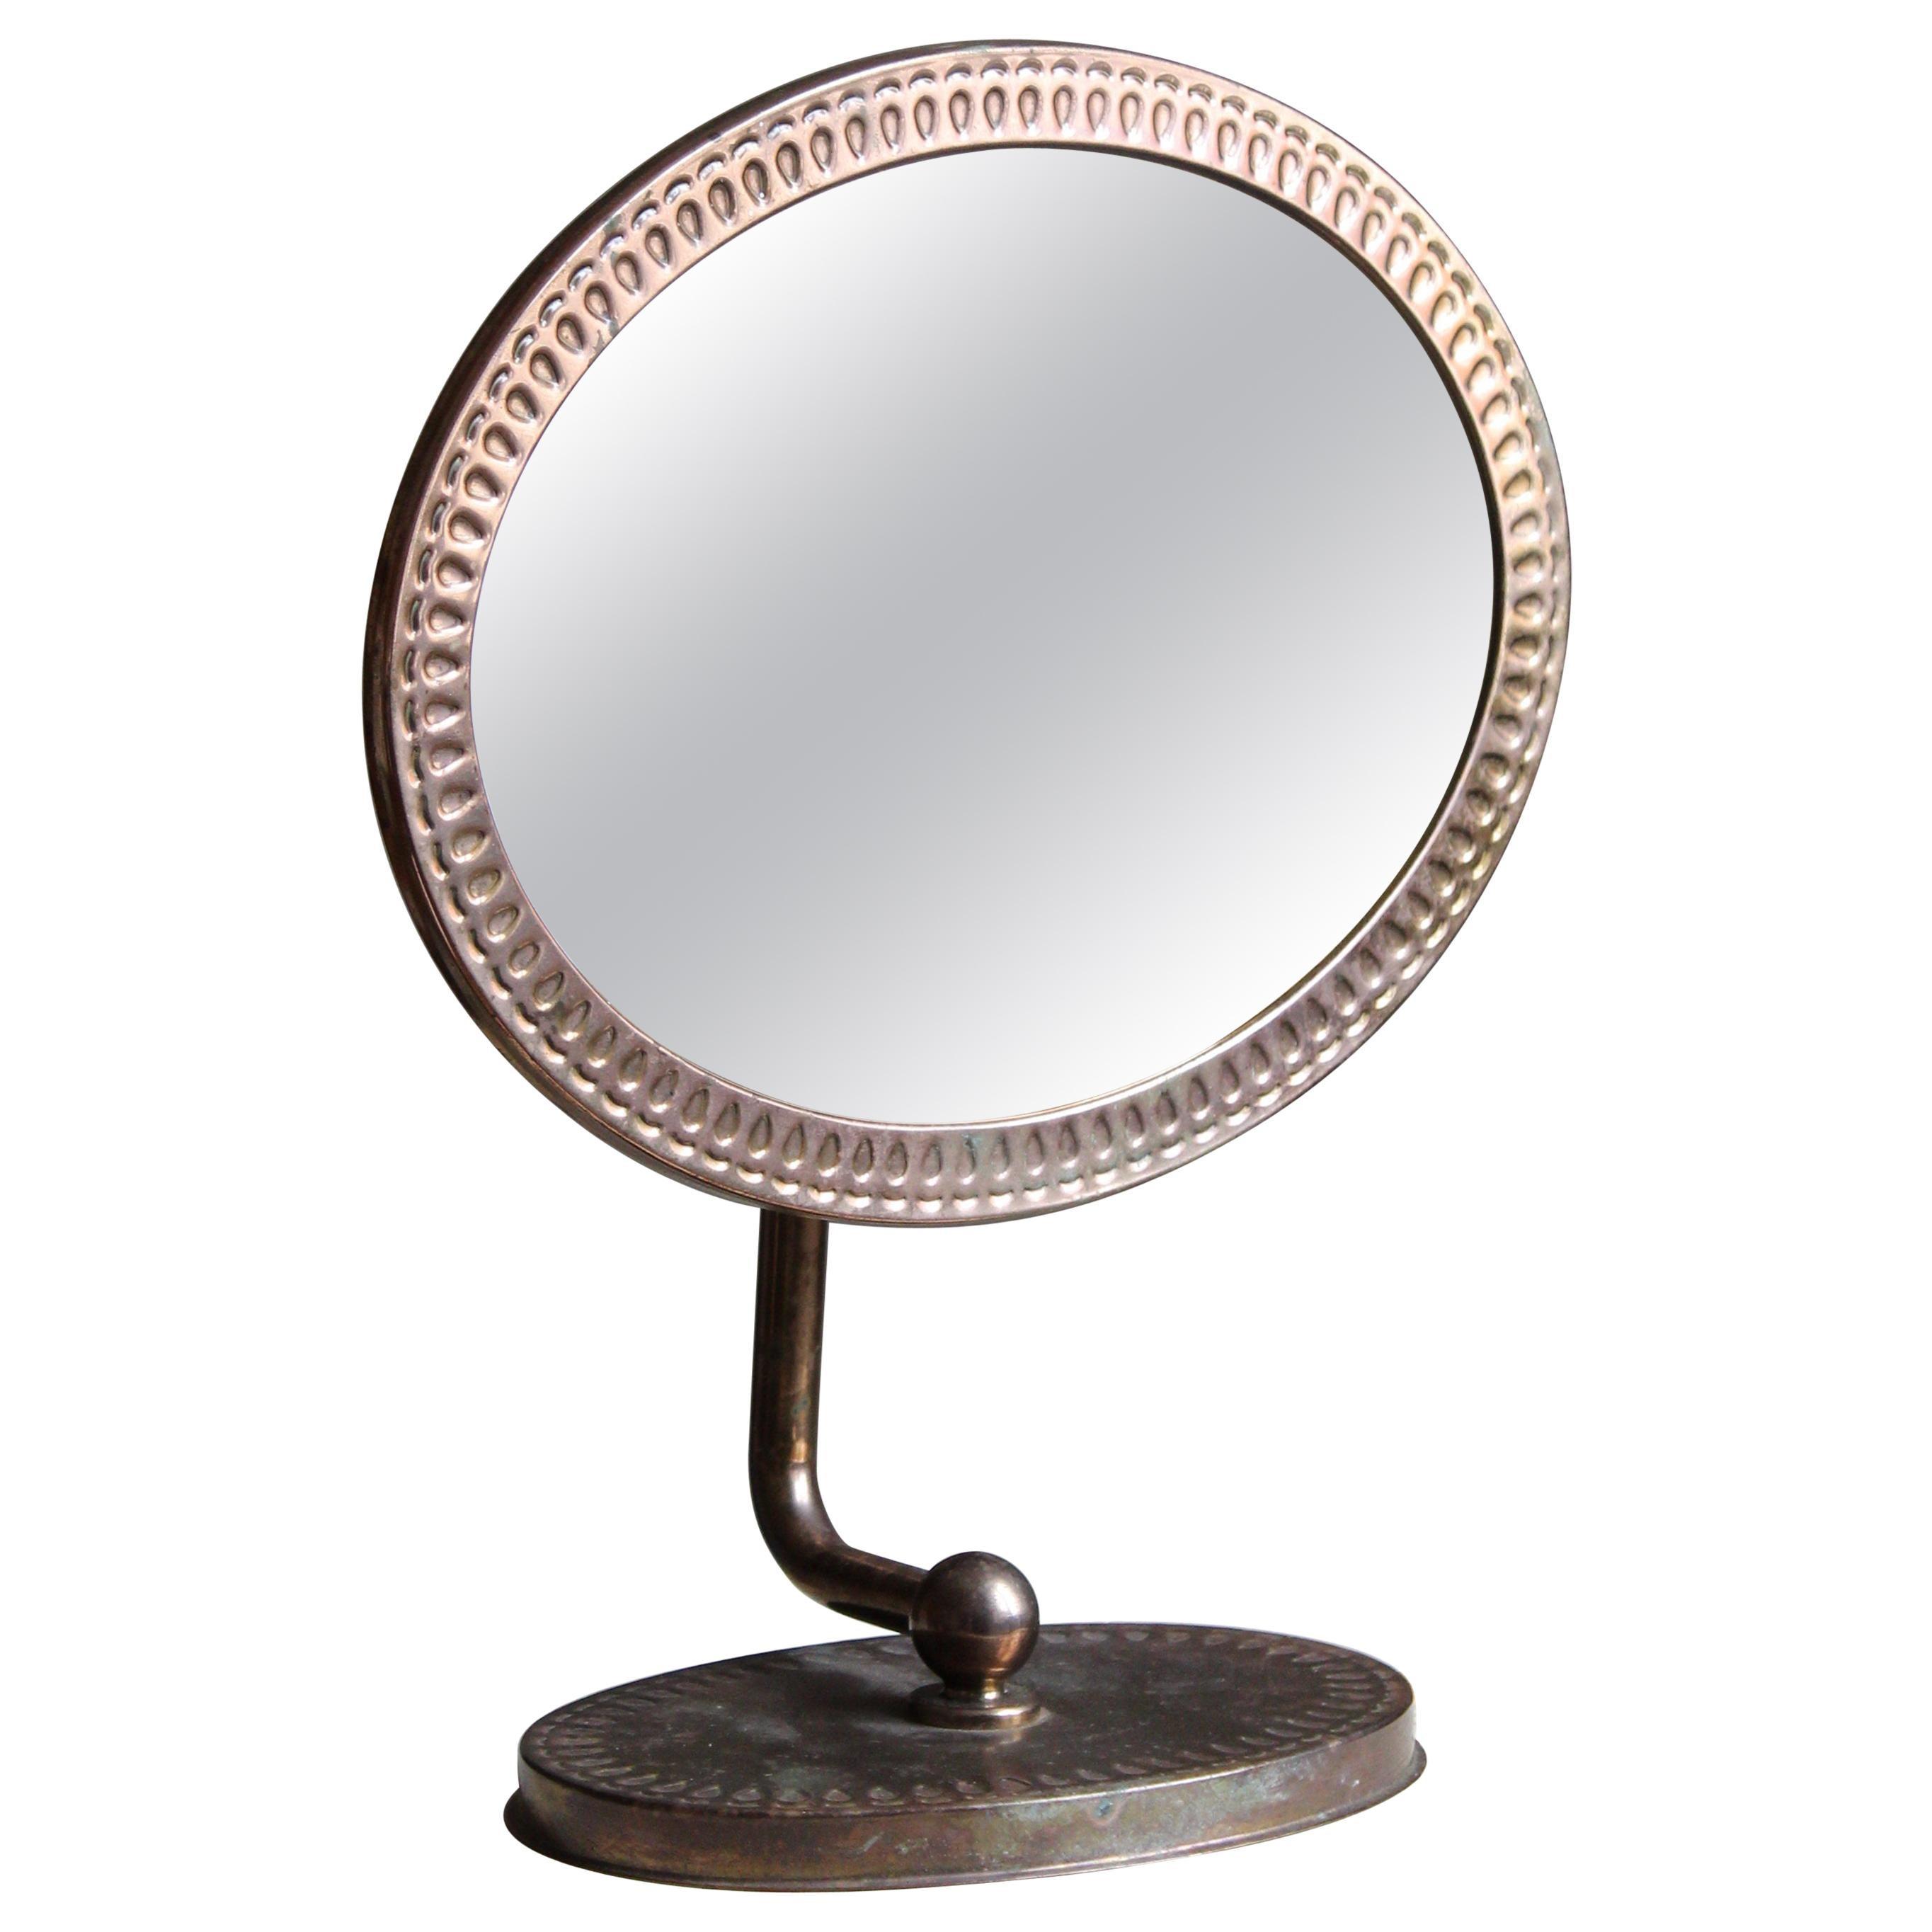 Swedish, Adjustable Table Mirror, Copper, Mirror Glass, Sweden, 1960s